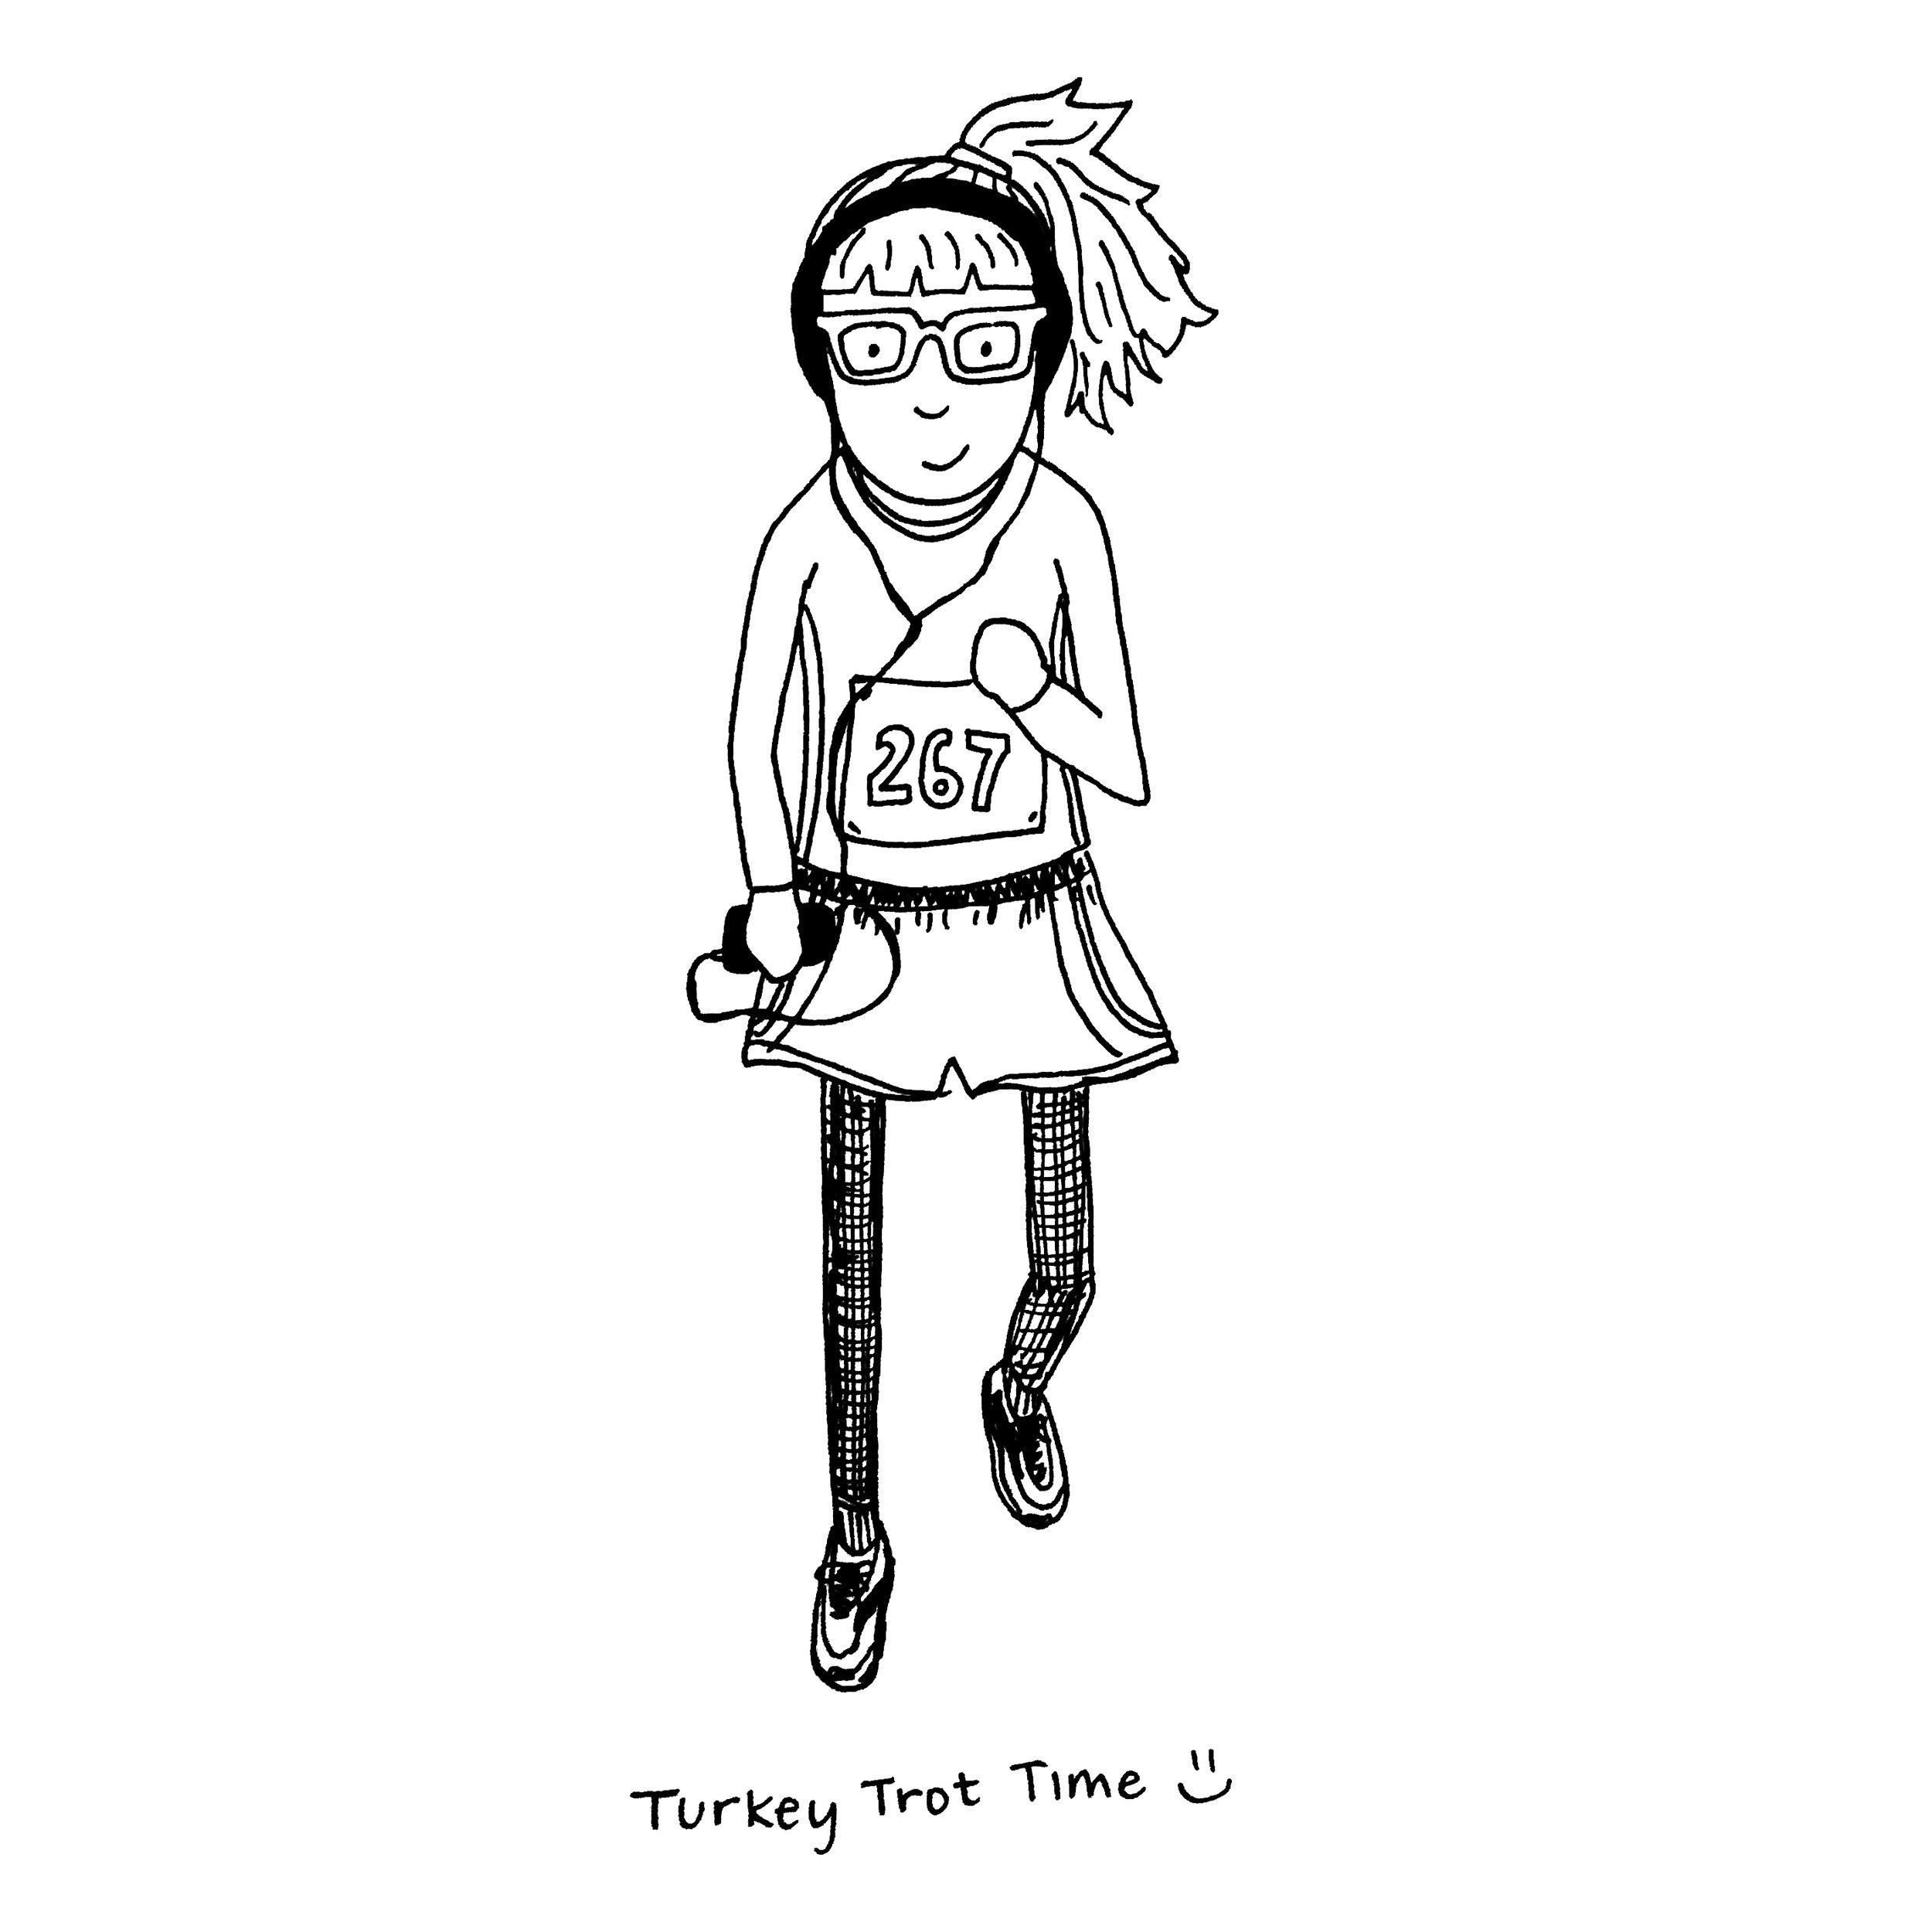 049_lucy-chen_turkey-trot-time.jpg